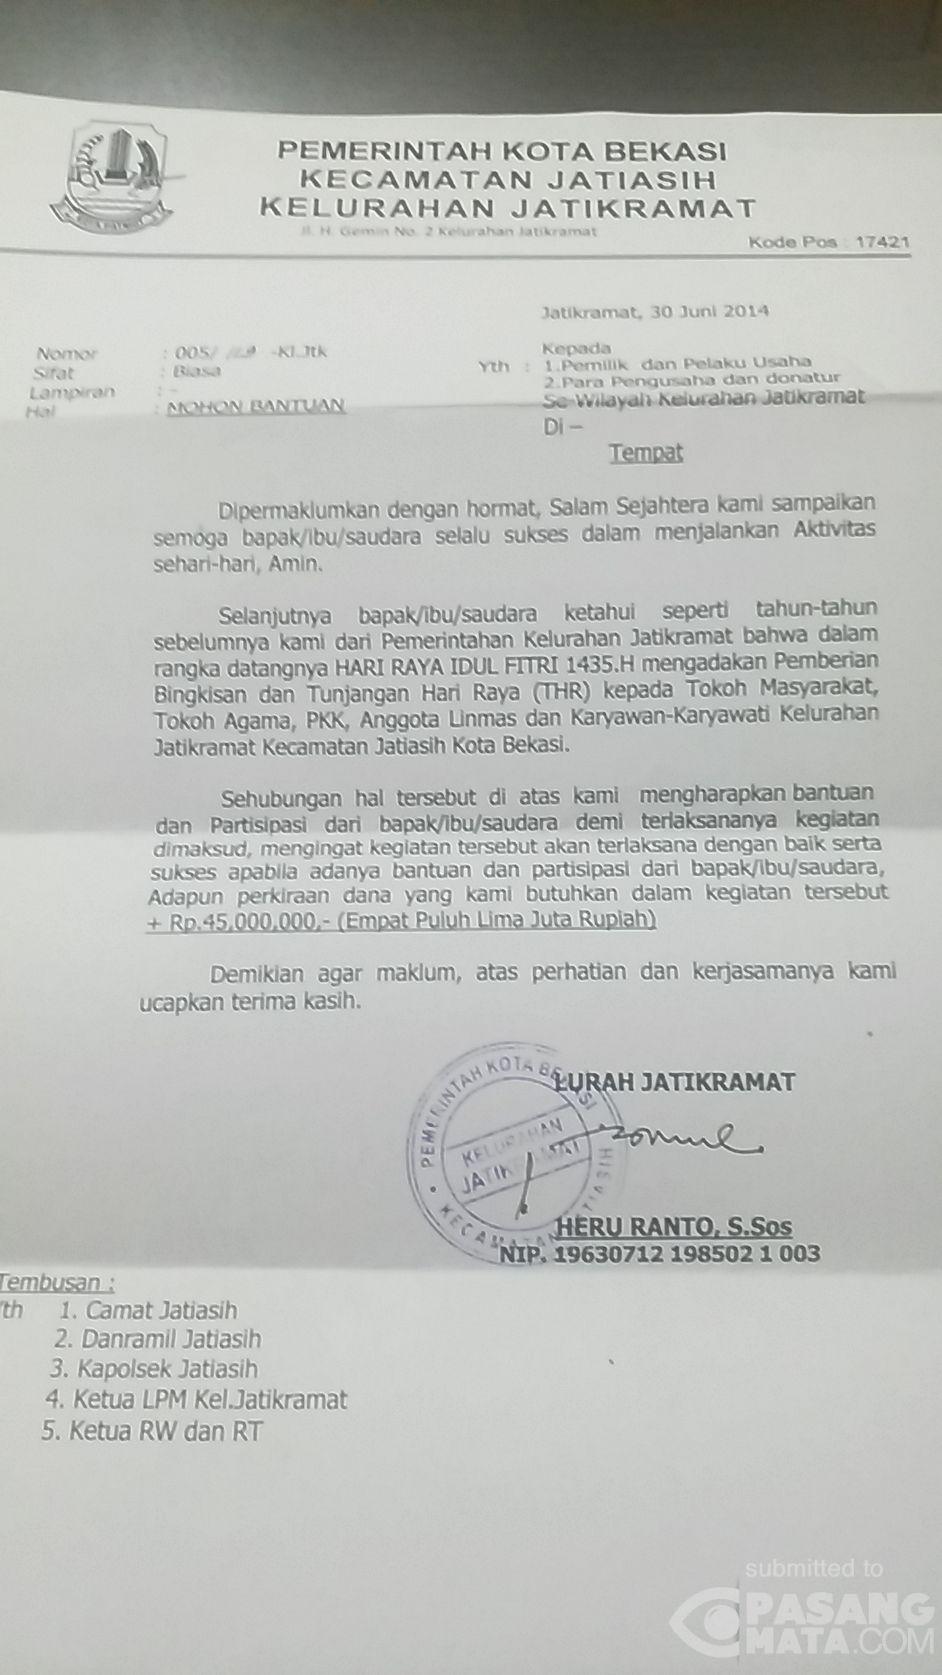 Ini Penampakan Surat Permohonan Bantuan Untuk Thr Di Bekasi Umum